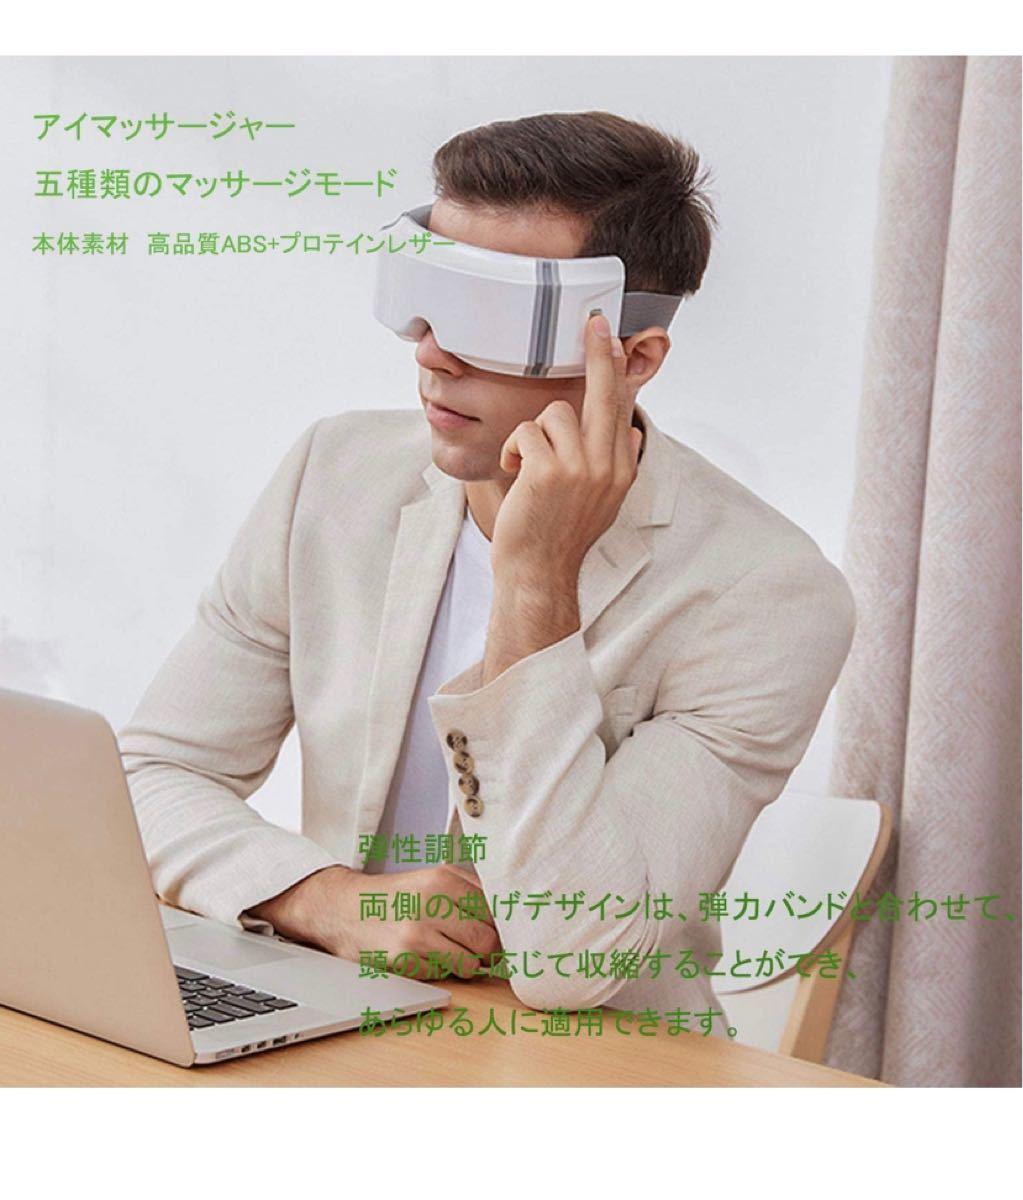 アイマッサージャー 目元マッサージャー